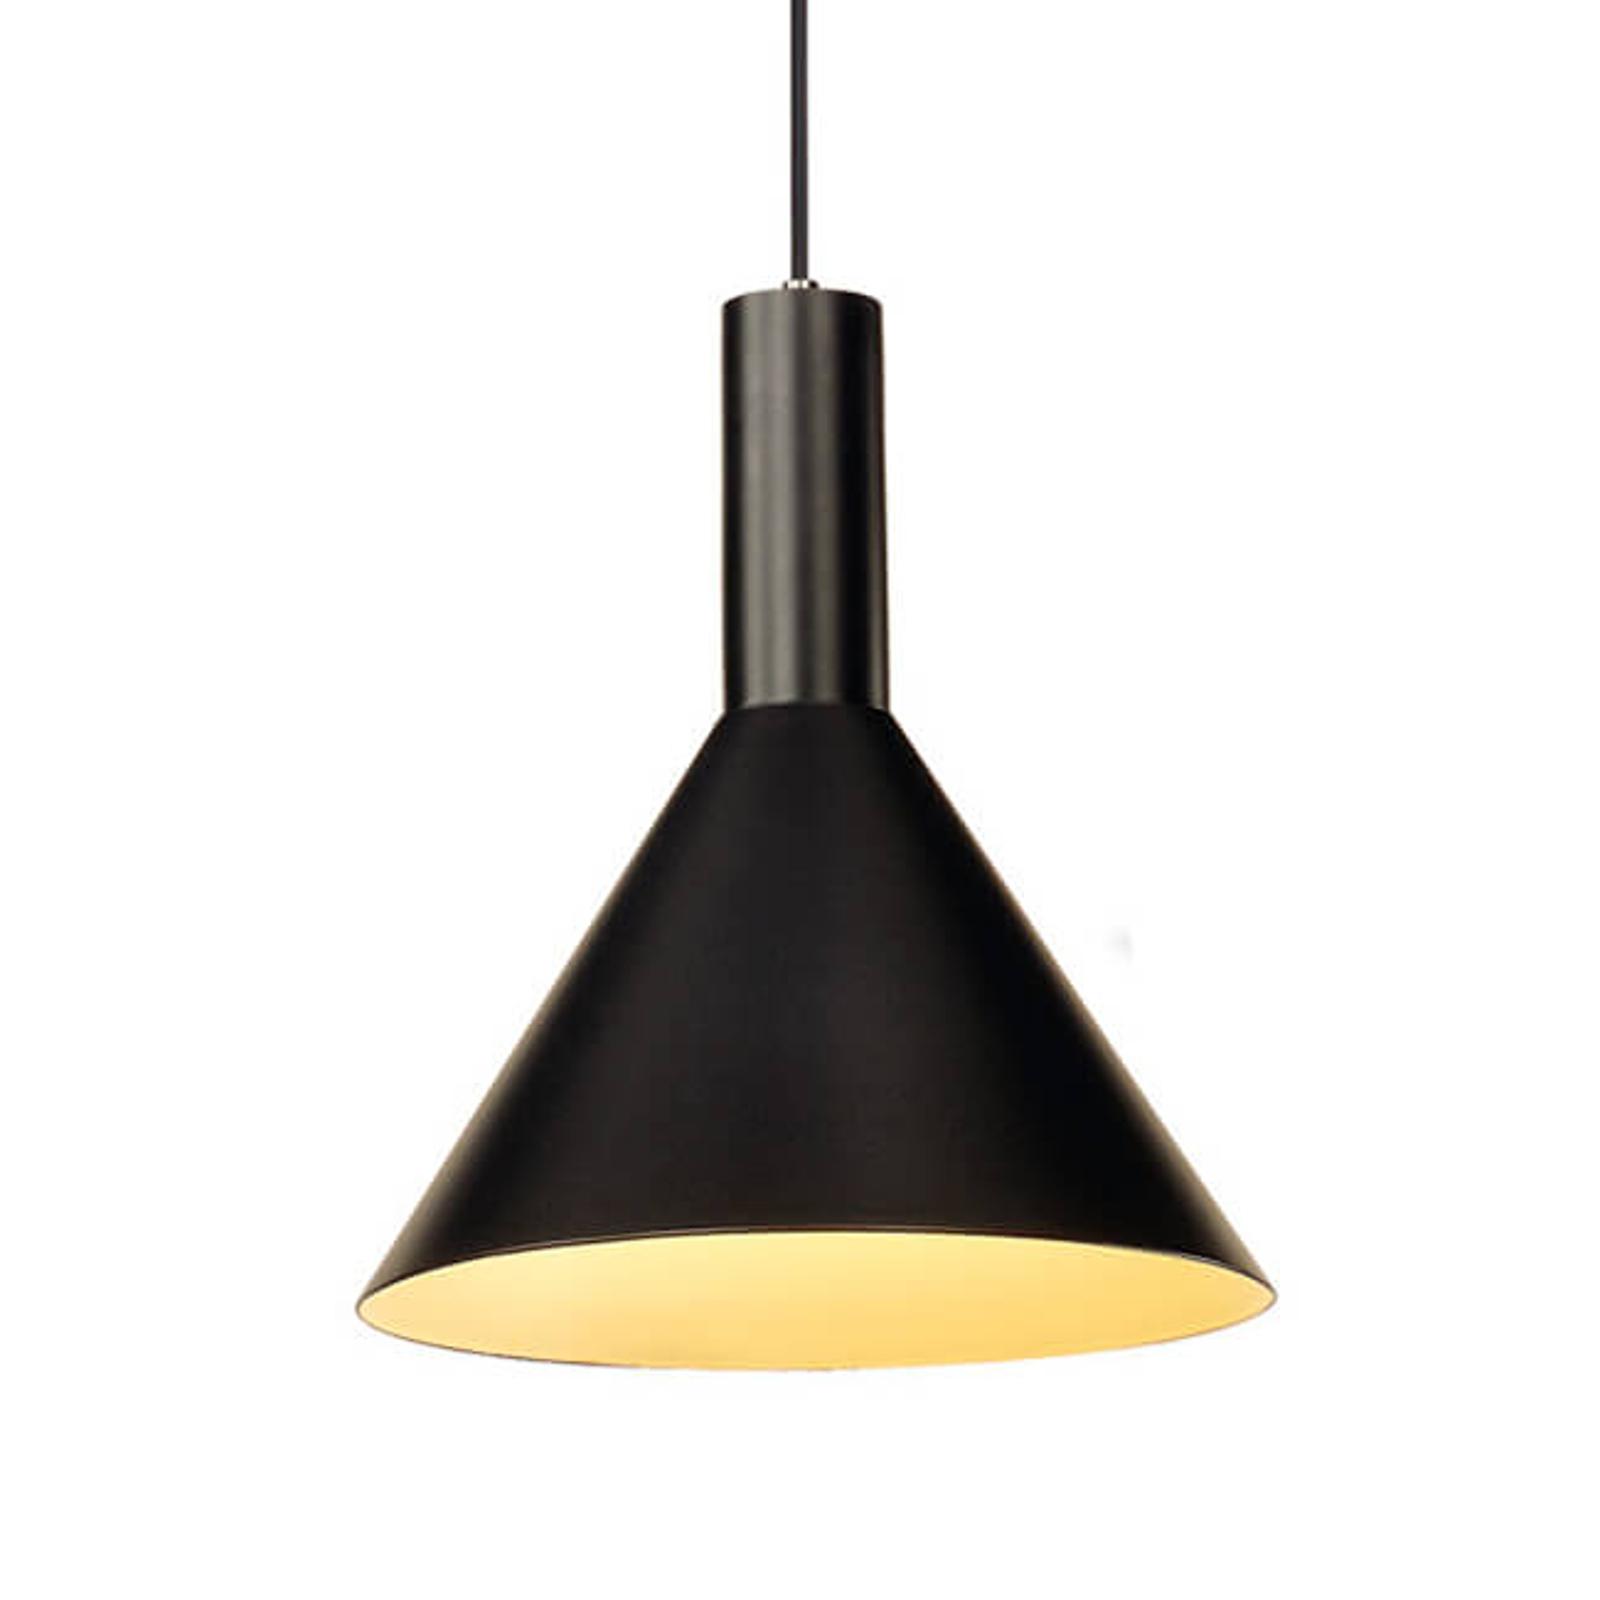 Fraai vormgegeven hanglamp Phelia